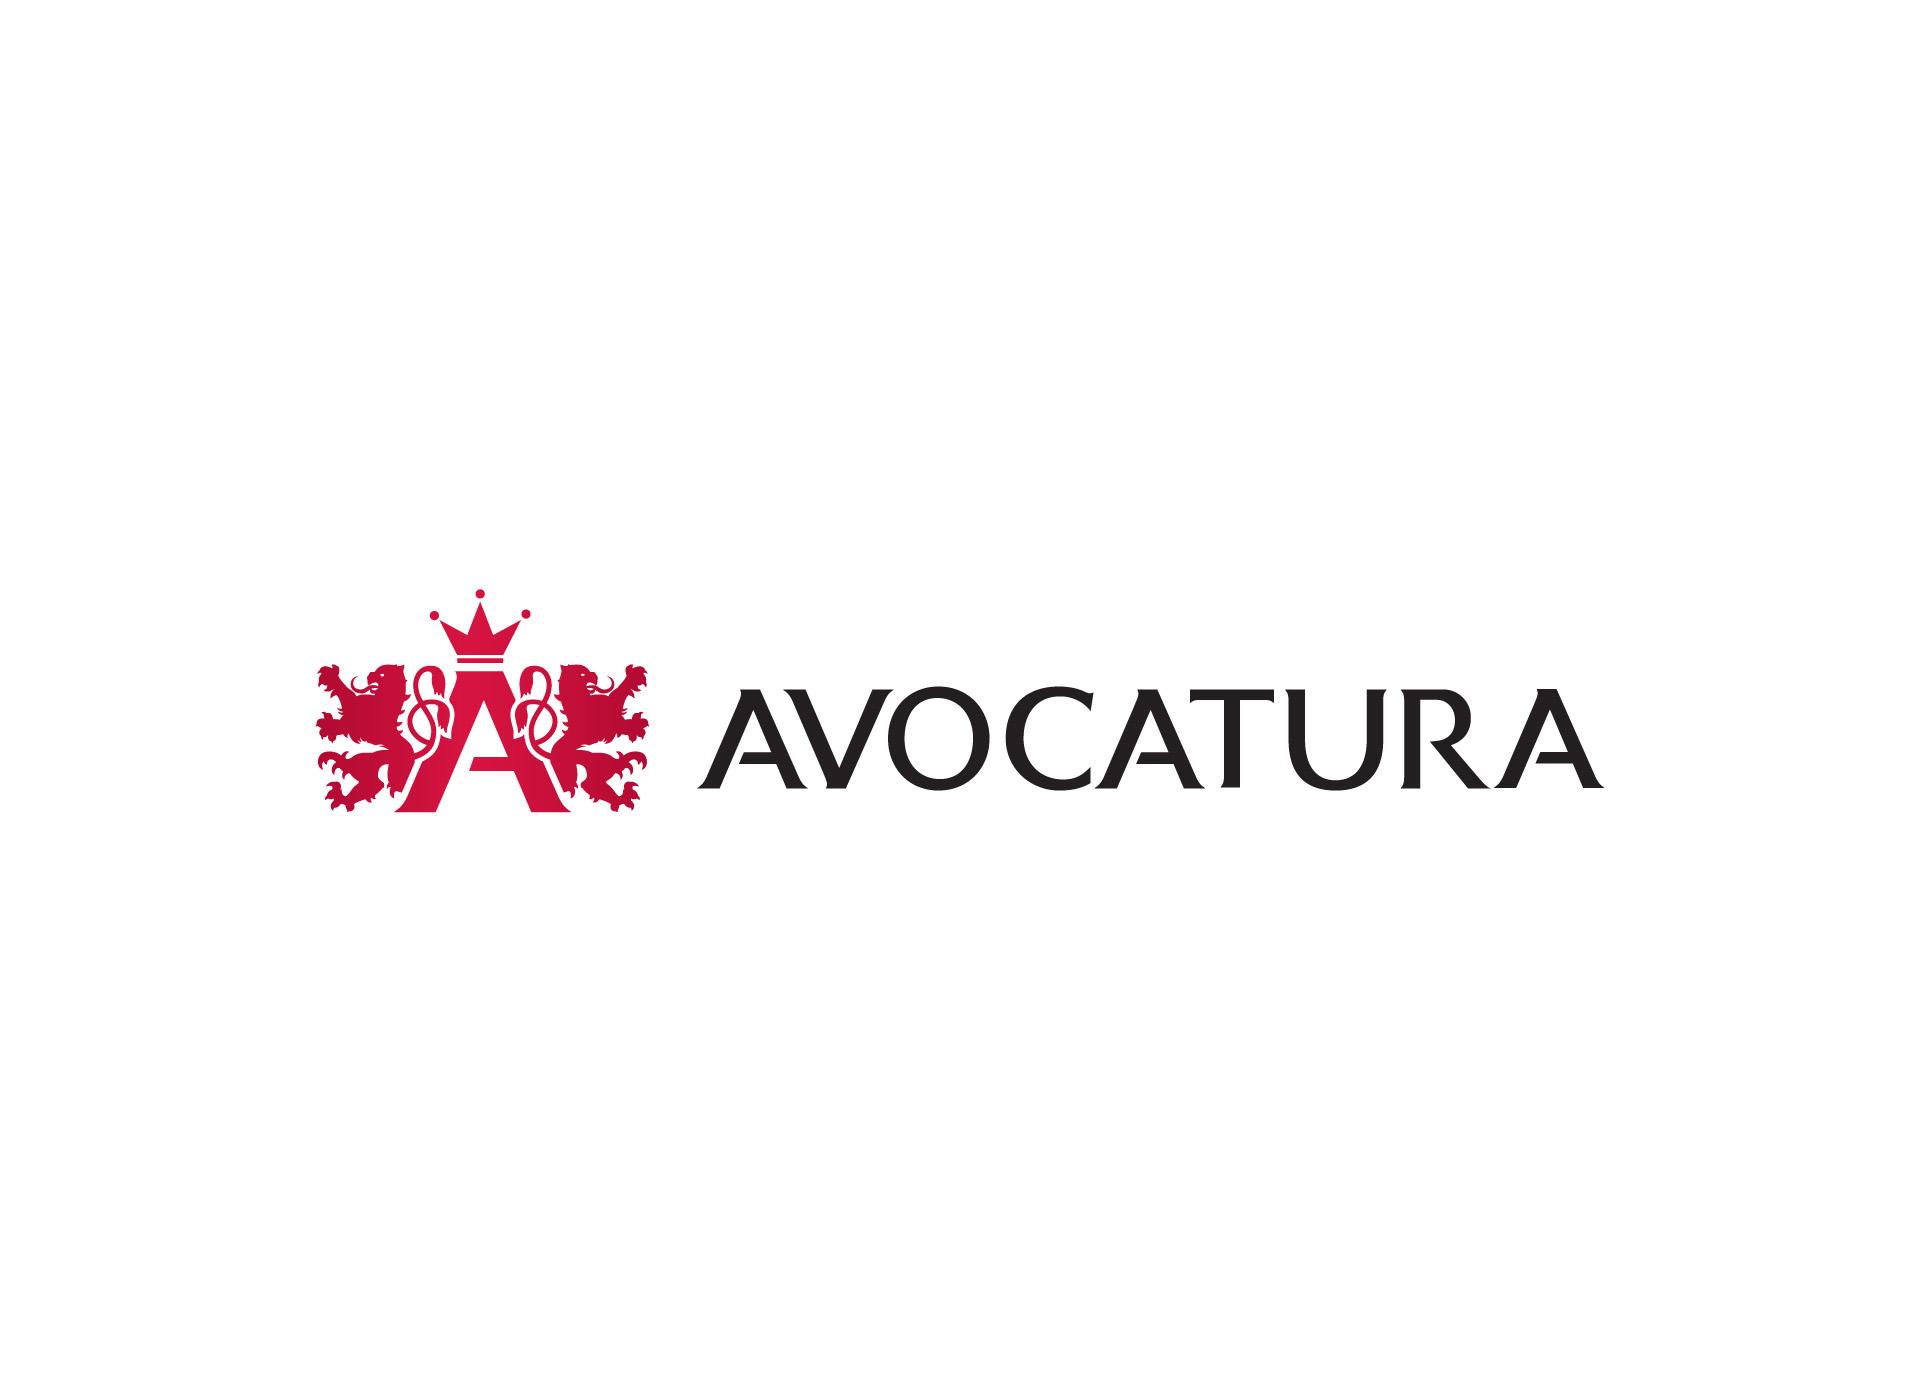 avocatura logo negativ inoveo branading agency